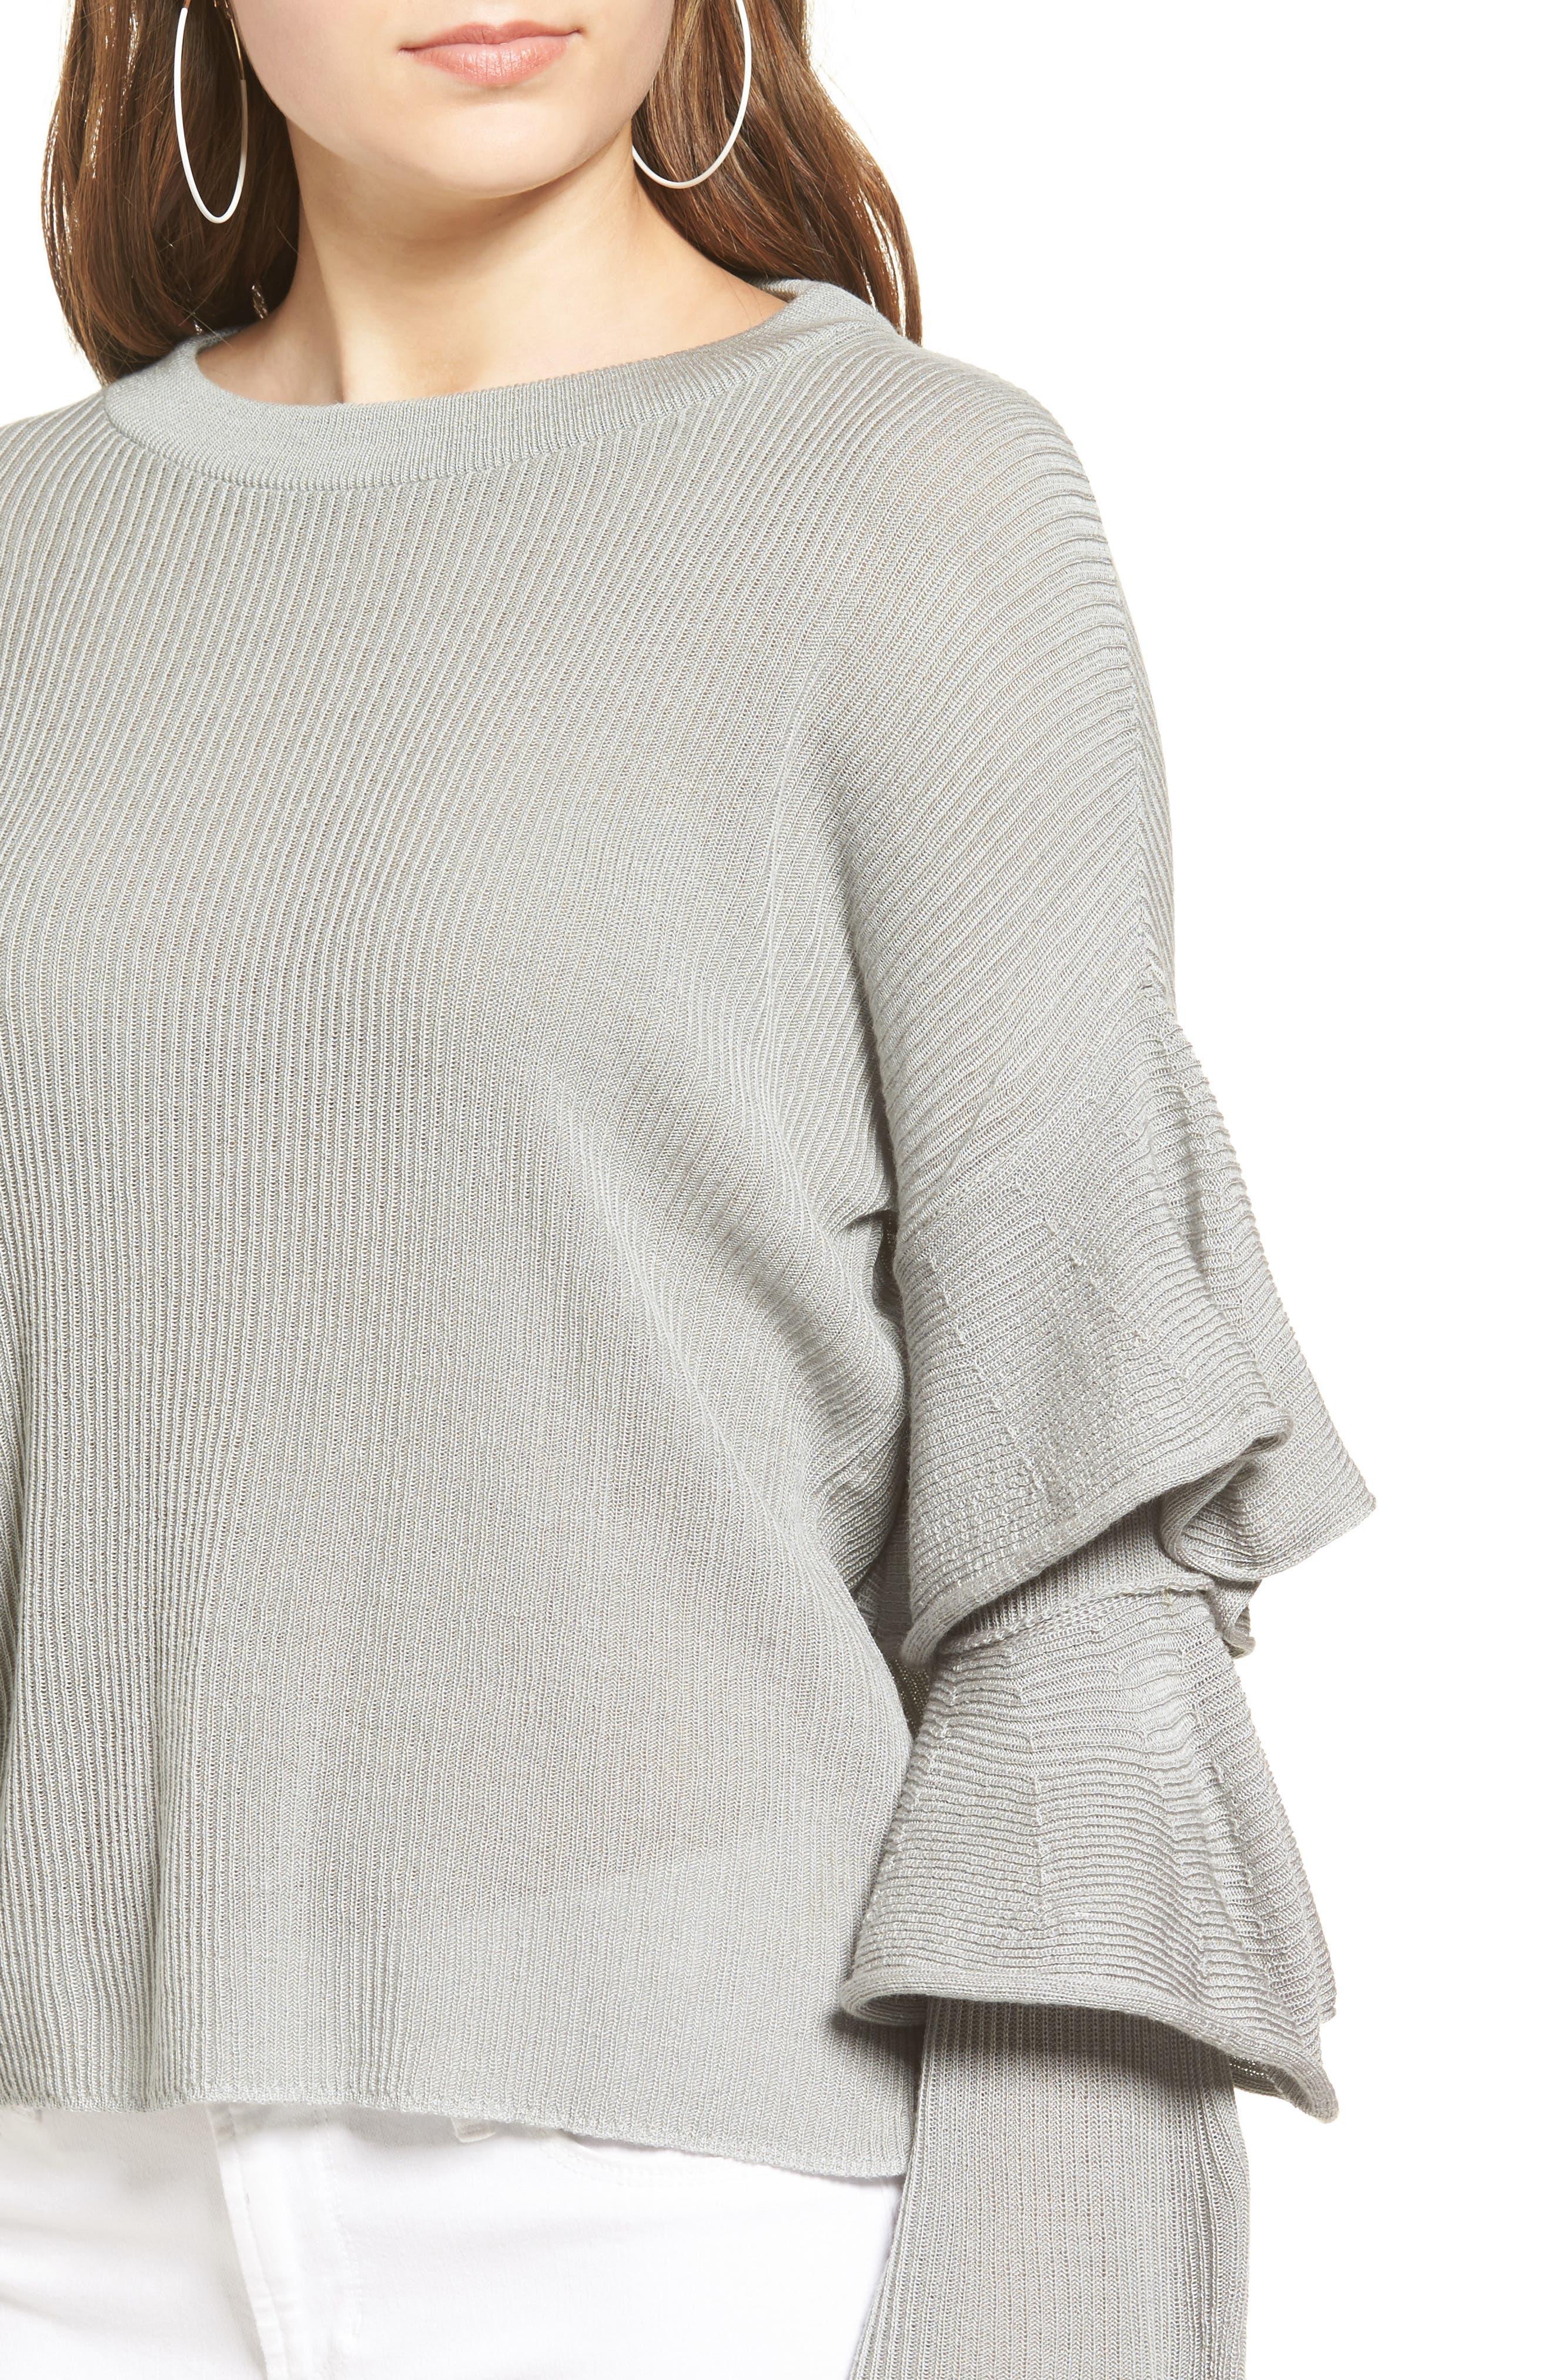 Ruffle Sleeve Sweater,                             Alternate thumbnail 4, color,                             034